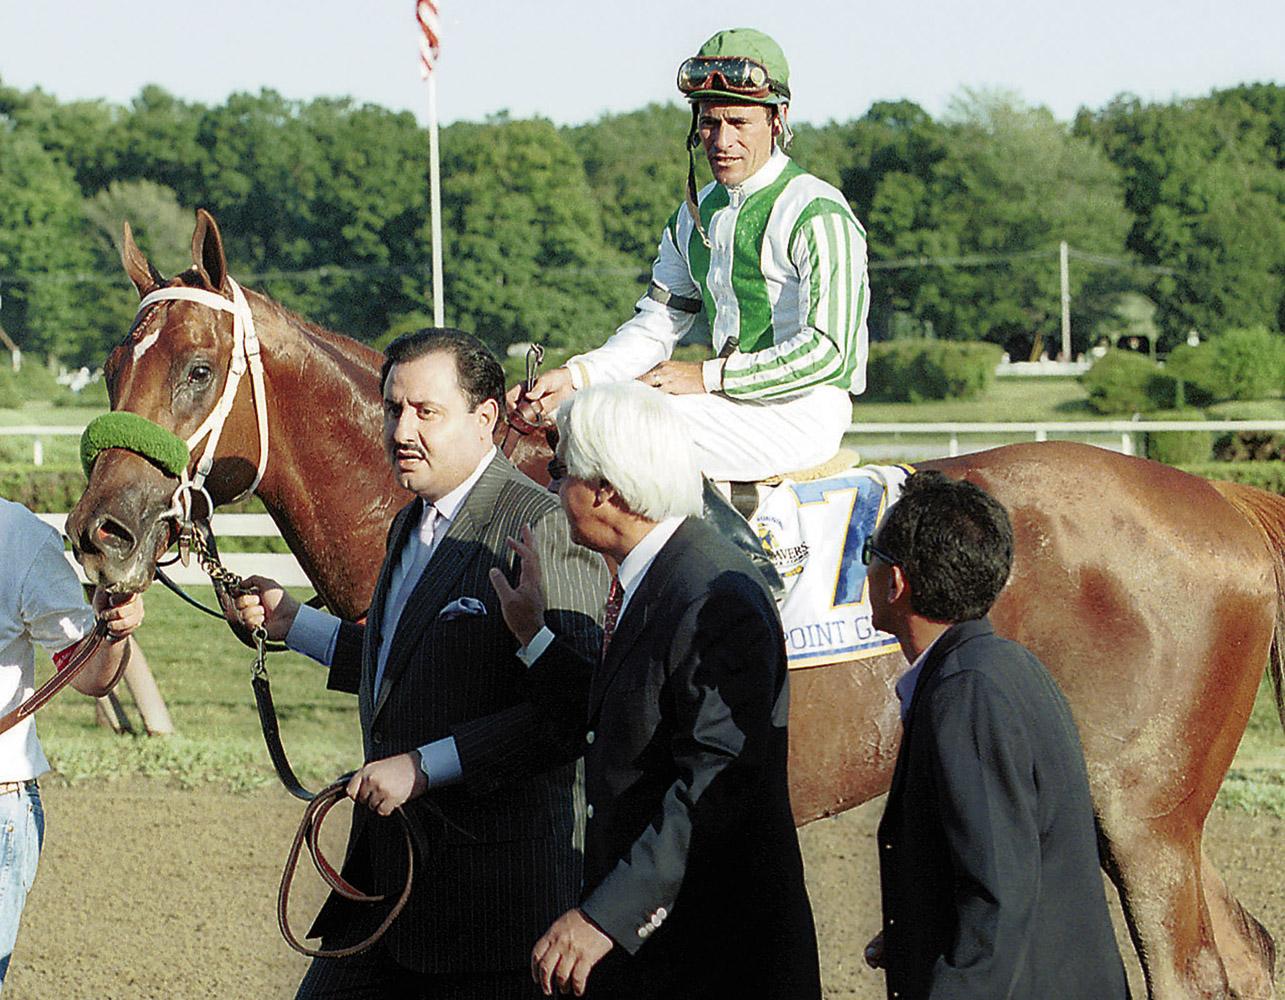 Point Given (Gary Stevens up) entering the winner's circle for the 2001 Travers (Tom Killips)